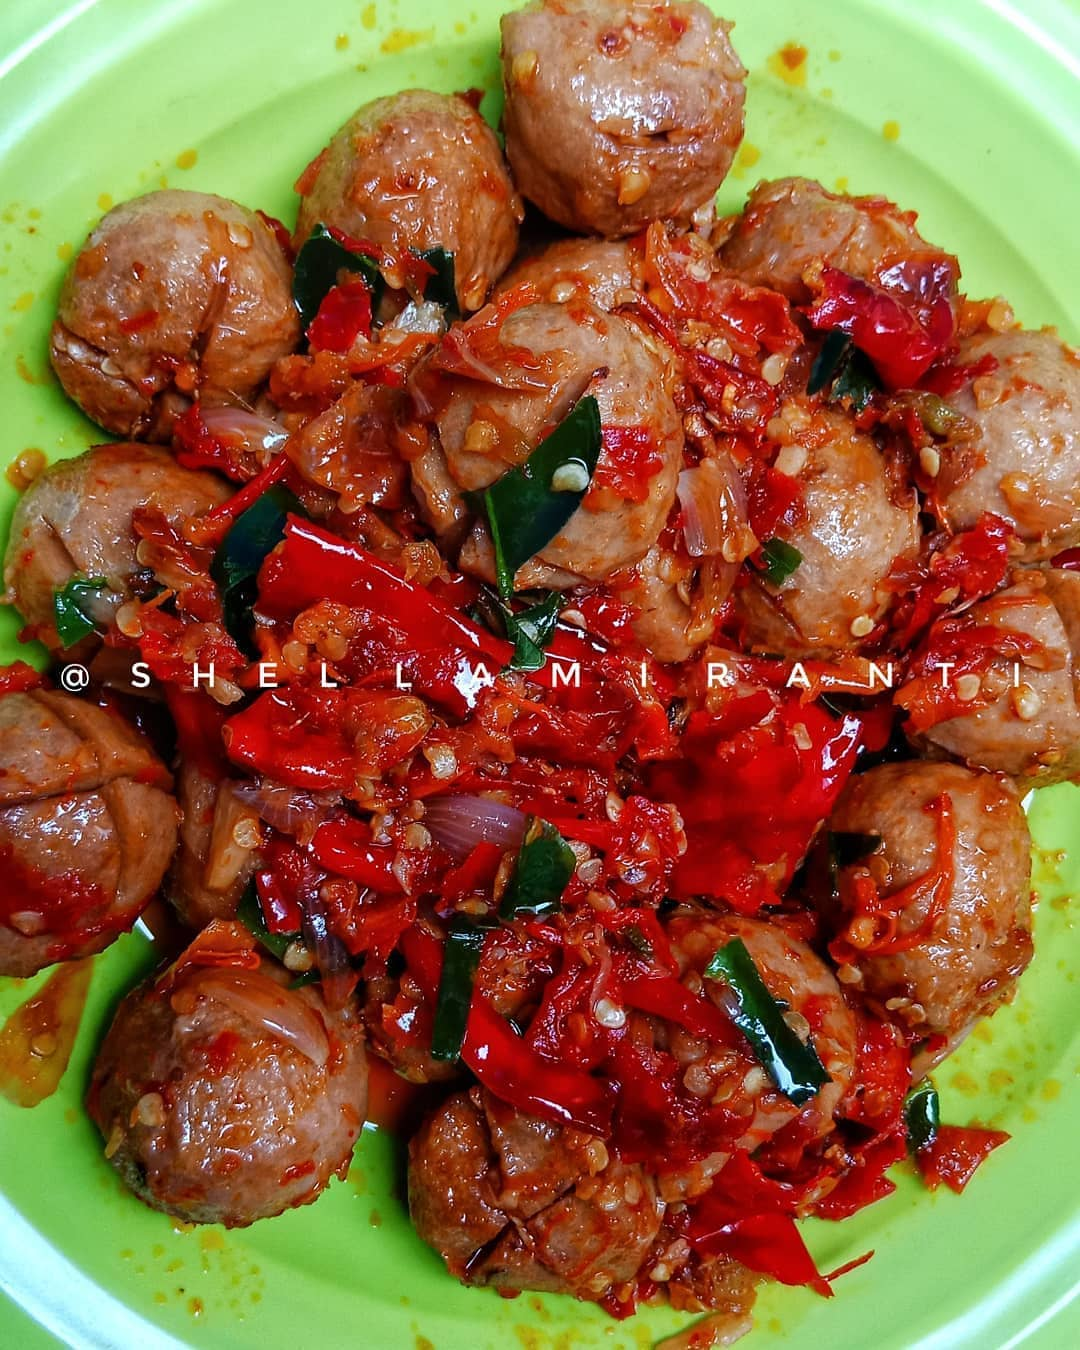 Cara Buat Bakso Mercon : bakso, mercon, Resep, Membuat, BAKSO, MERCON, Masakan, Bunda